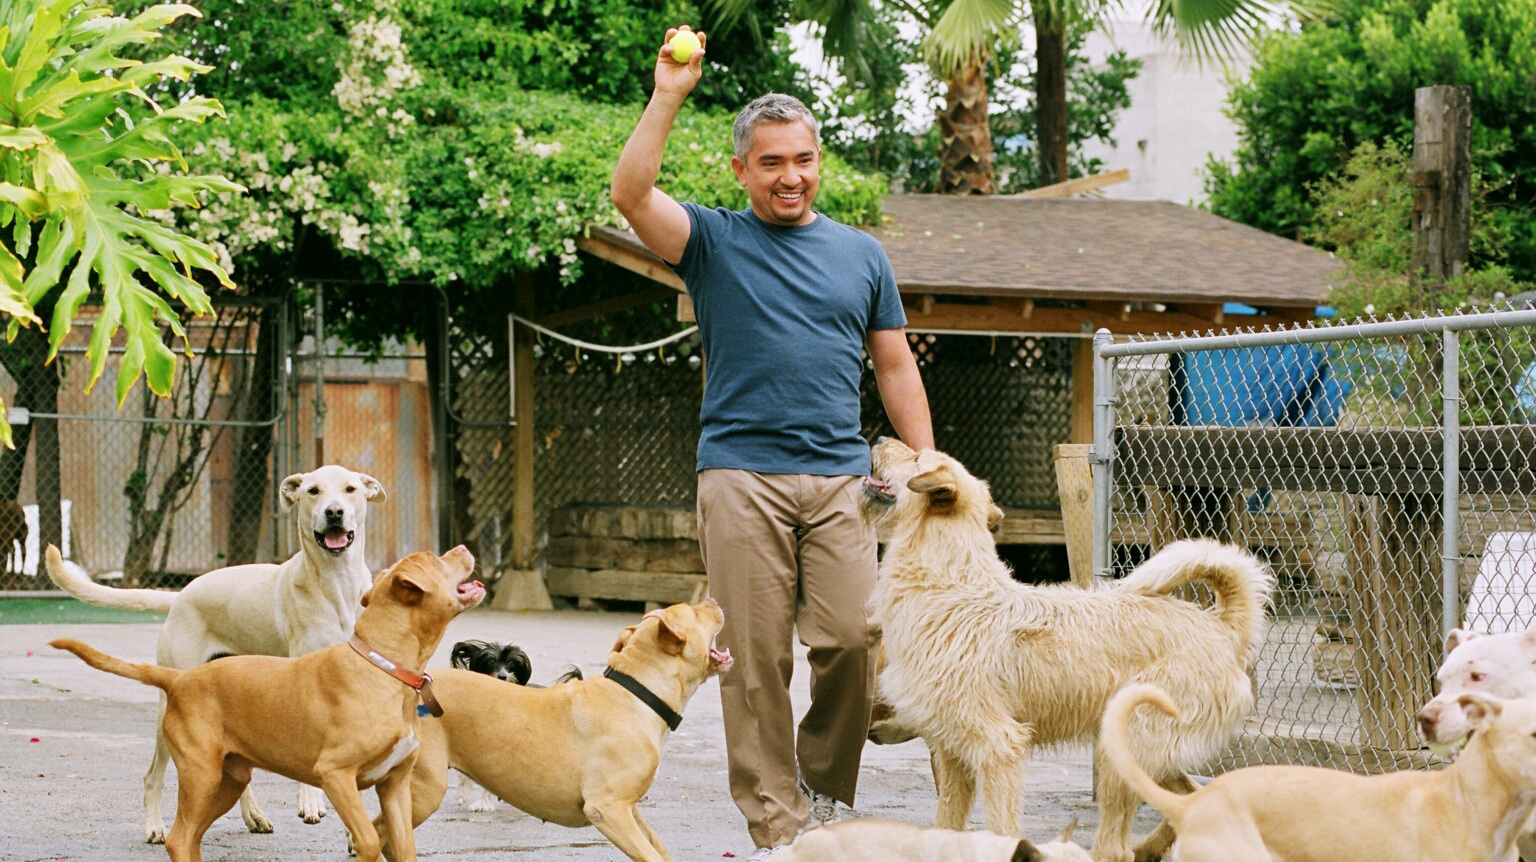 Cesar Millan's Long Walk To Becoming The 'Dog Whisperer'